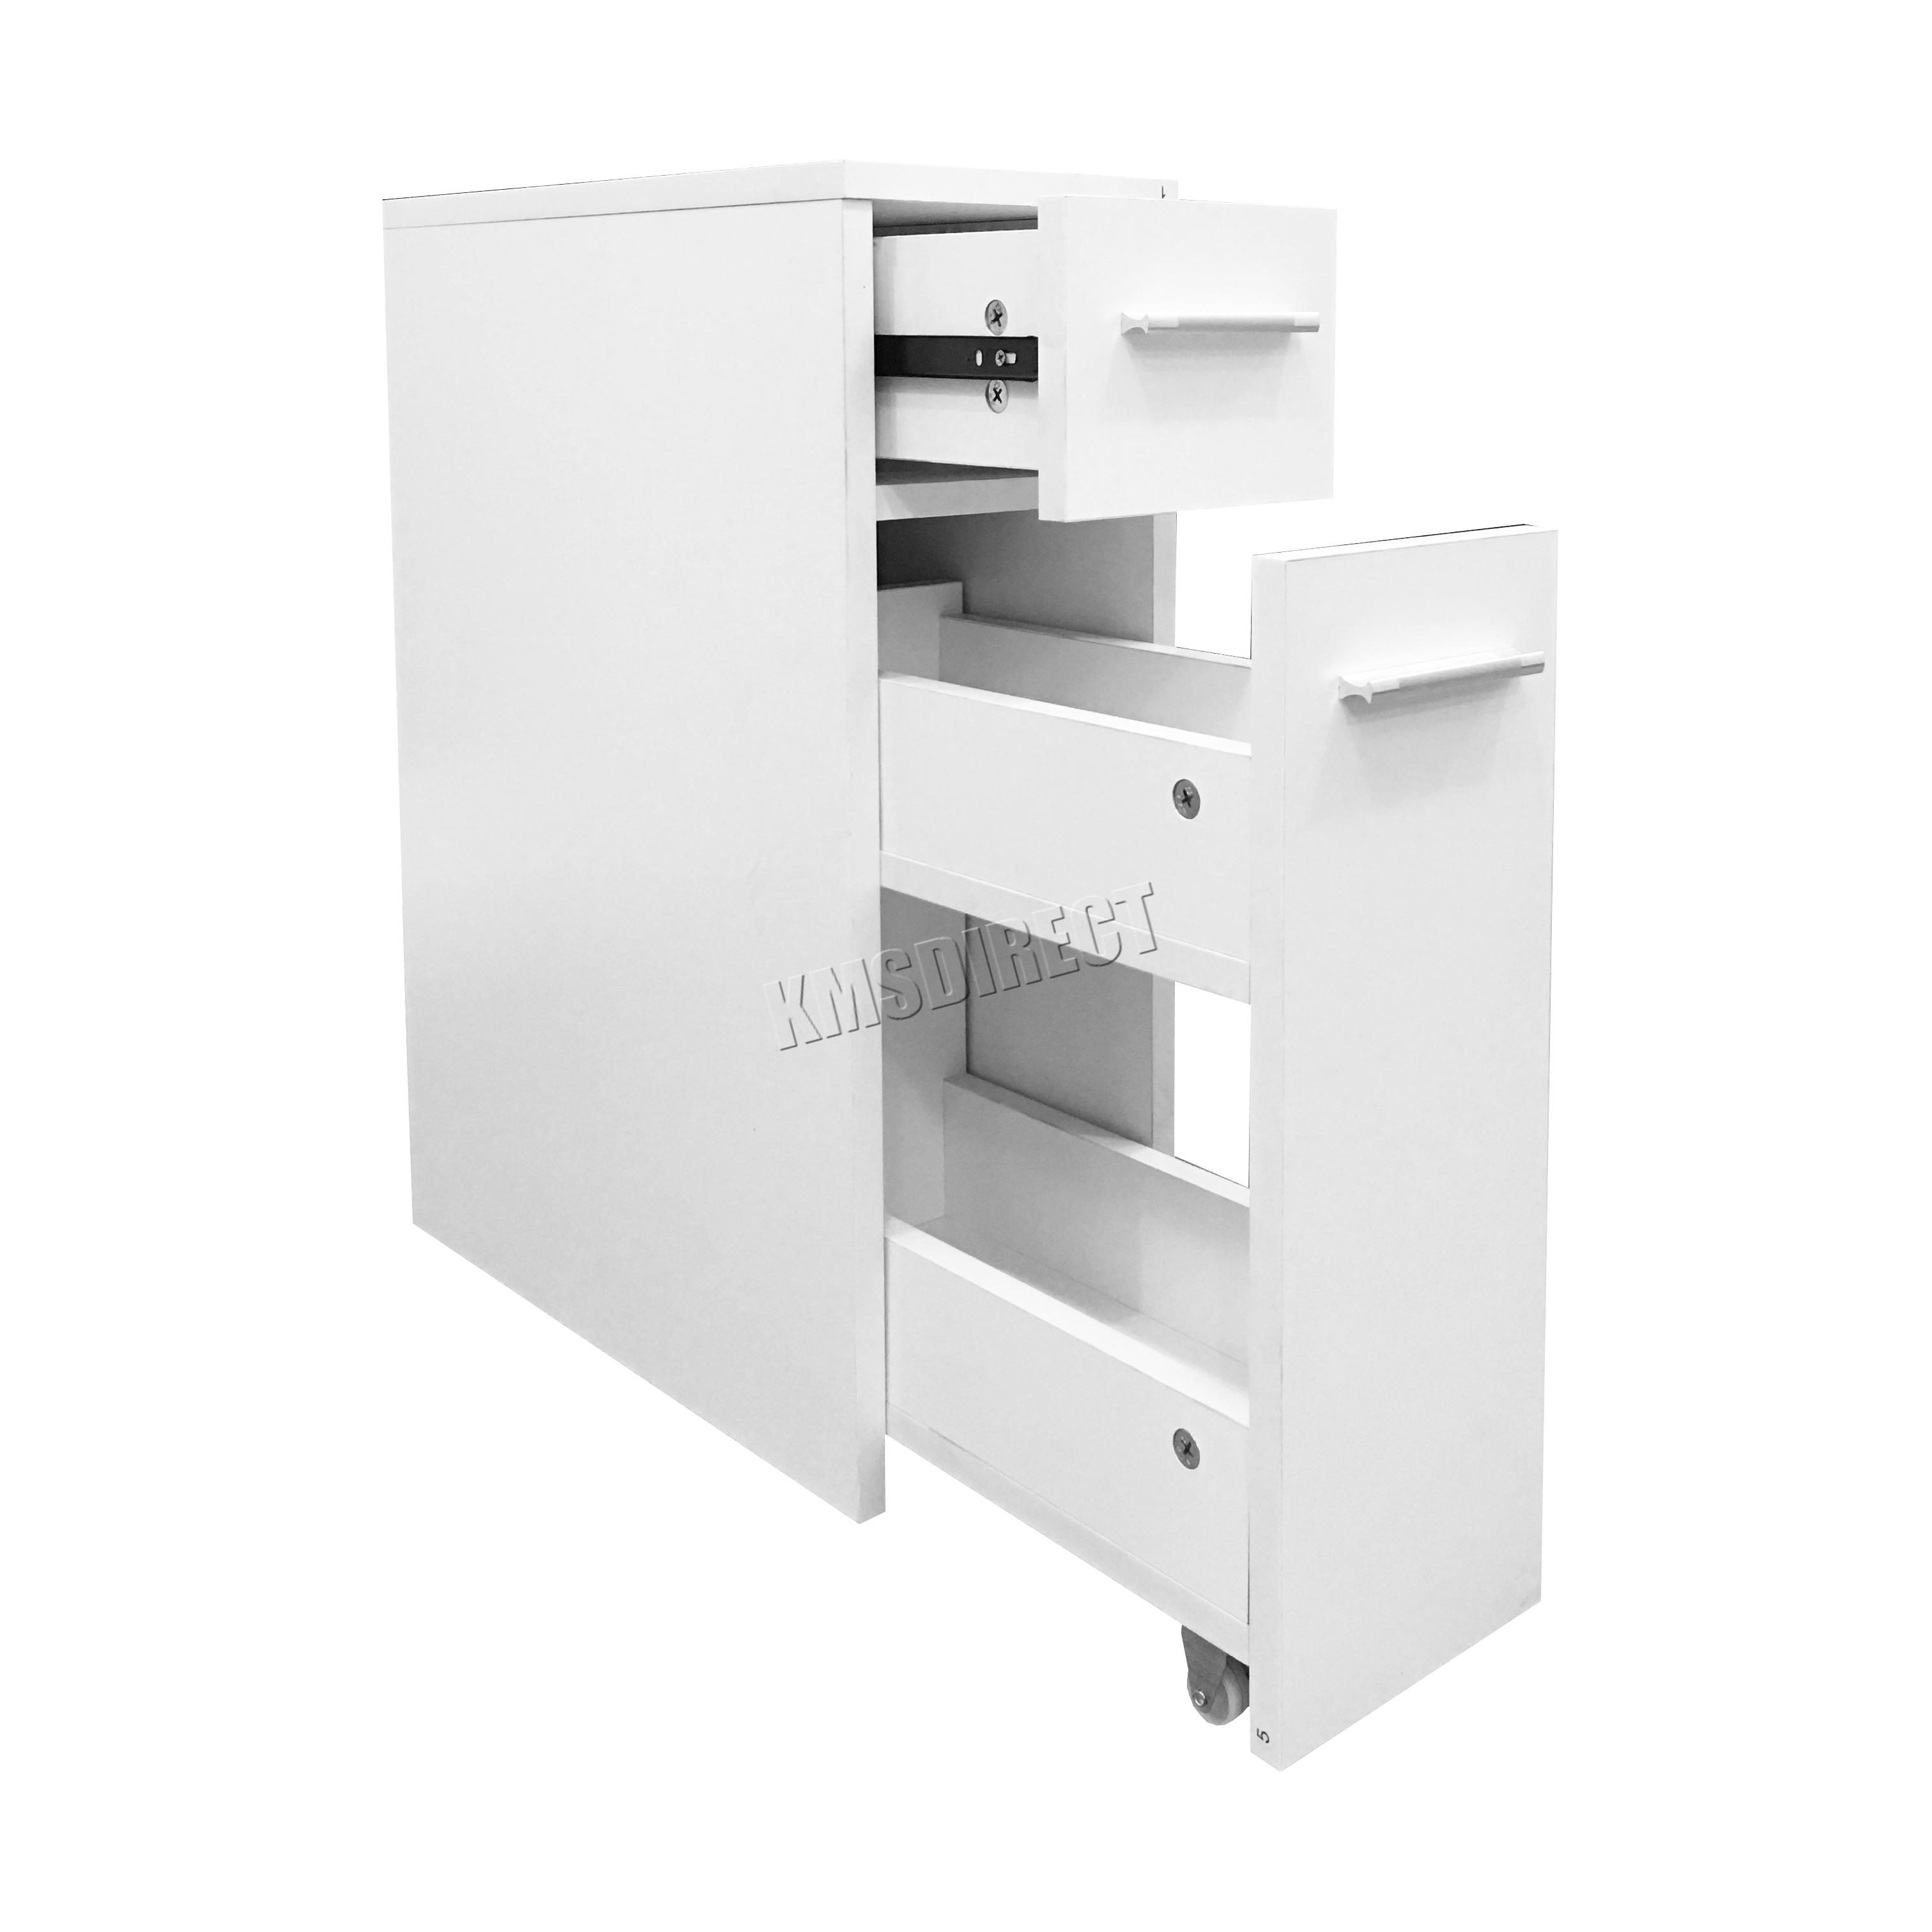 Bathroom drawer units in white - Sentinel Foxhunter Slimline Bathroom Slide Out Storage Drawer Cabinet Cupboard Unit White